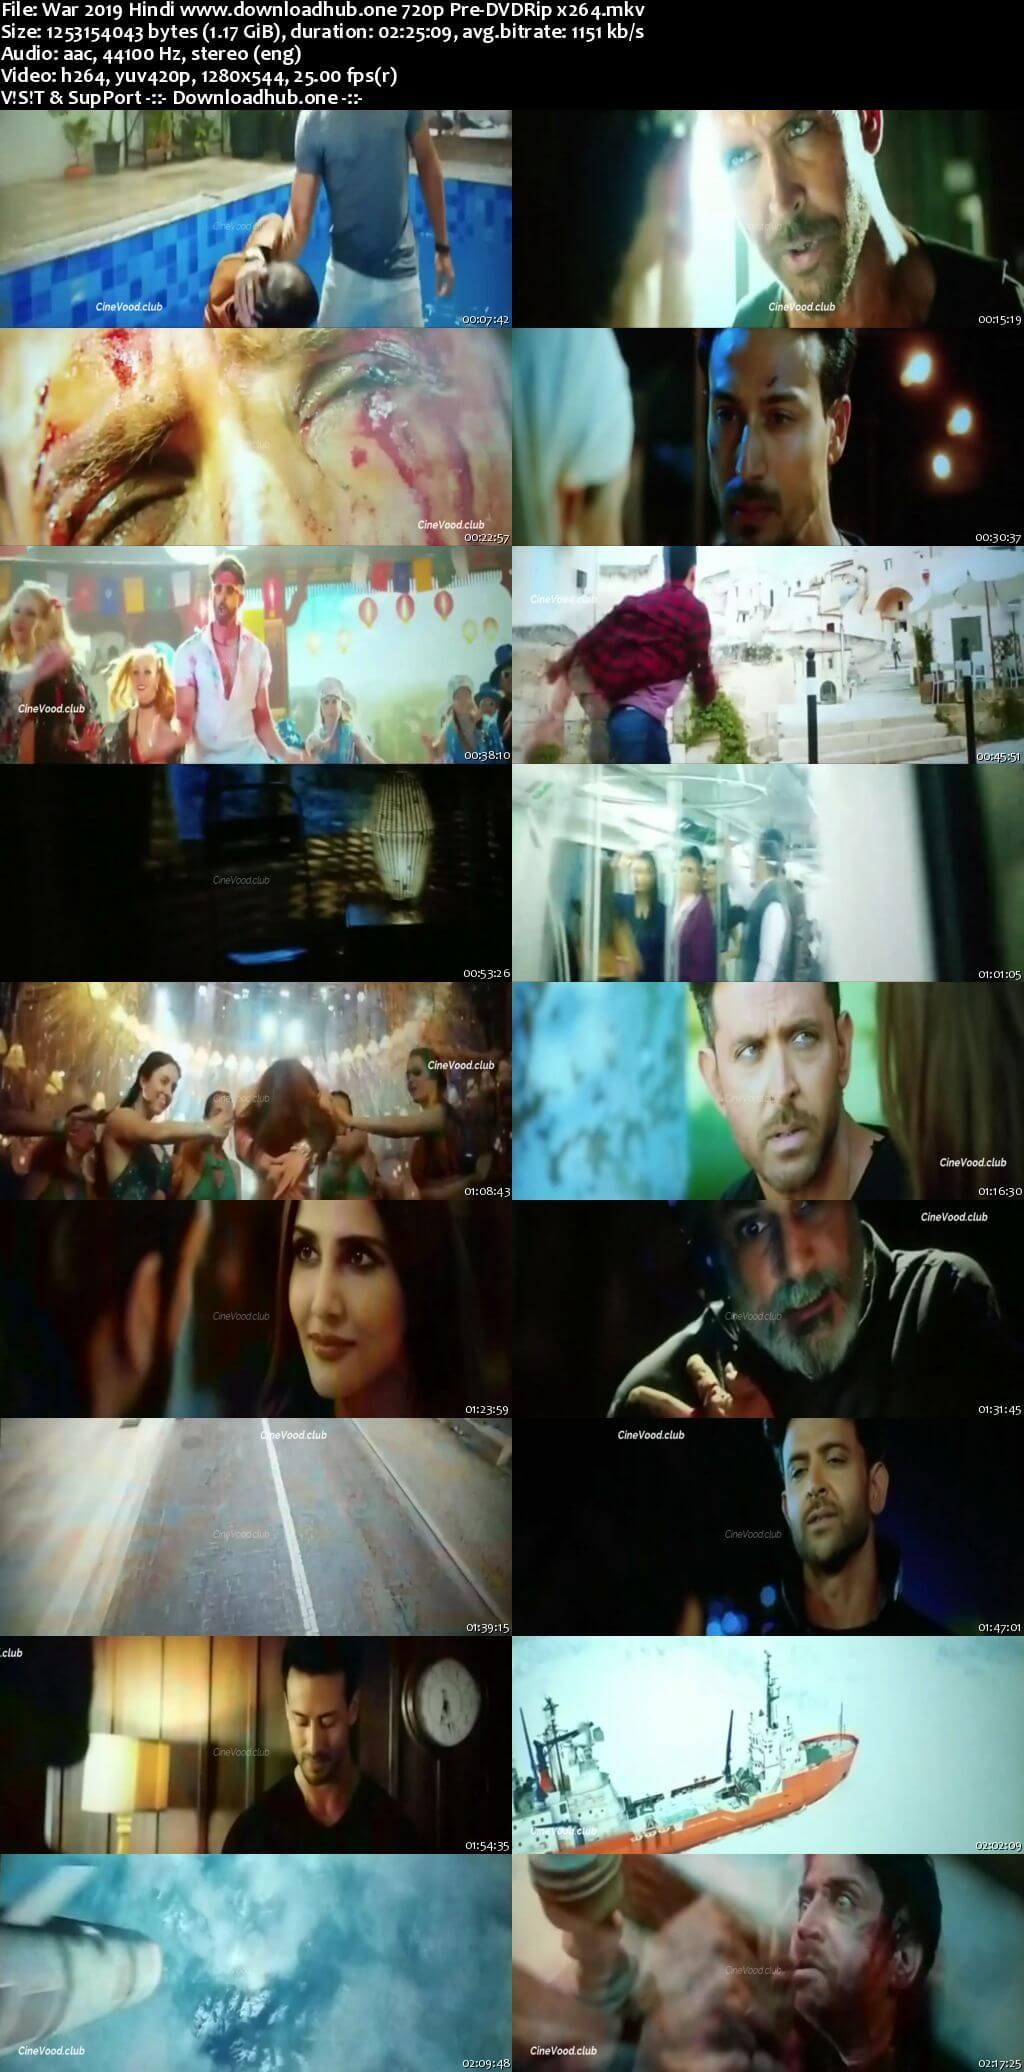 War 2019 Hindi 720p Pre-DVDRip x264